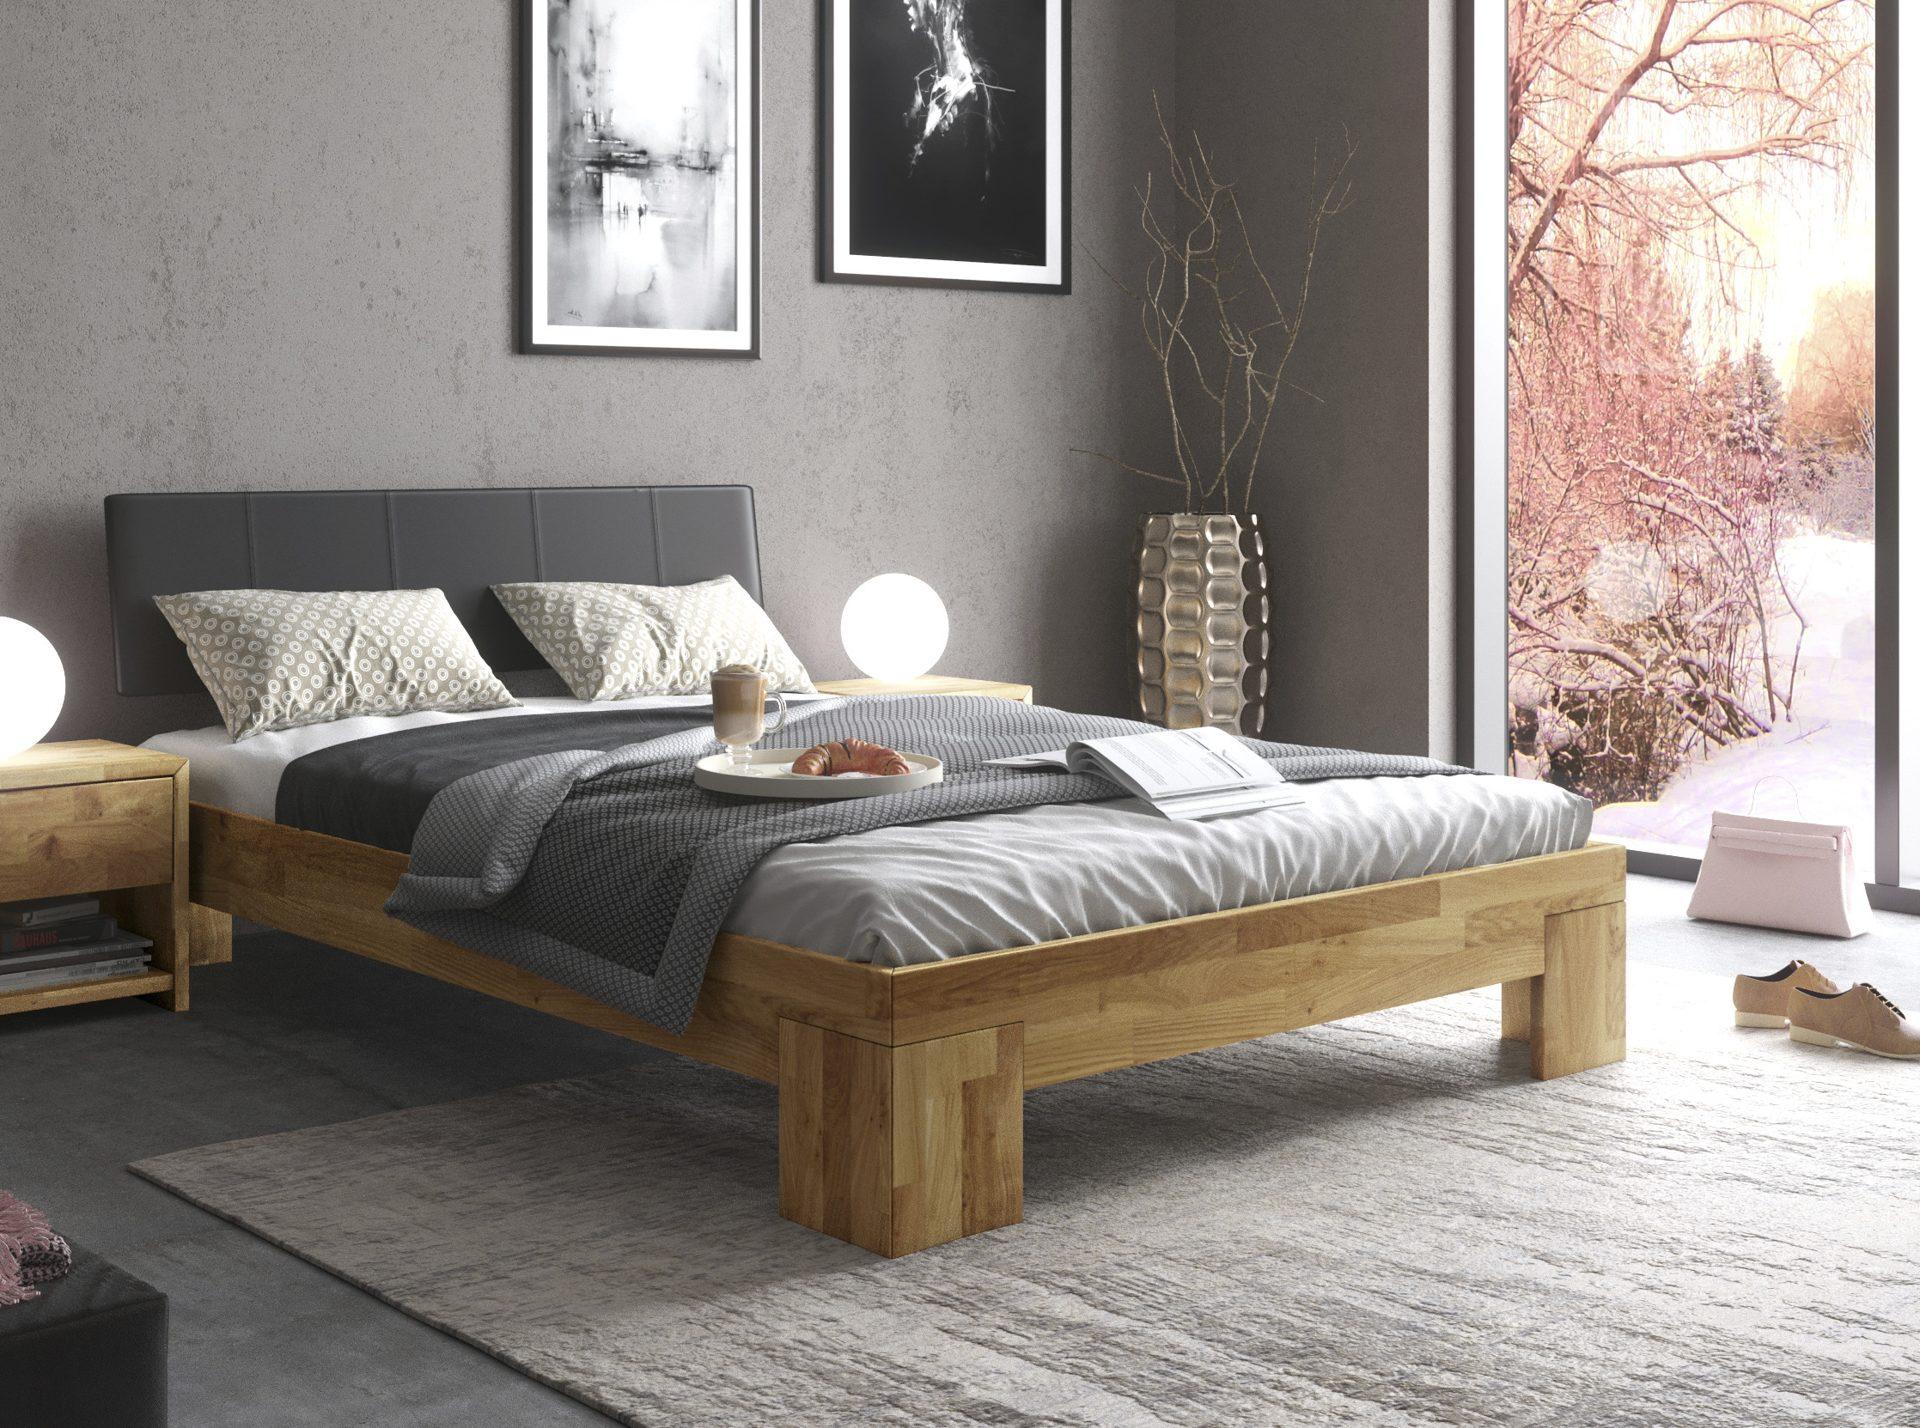 Möbel Bernskötter Gmbh Möbel A Z Betten Massivholzmöbel